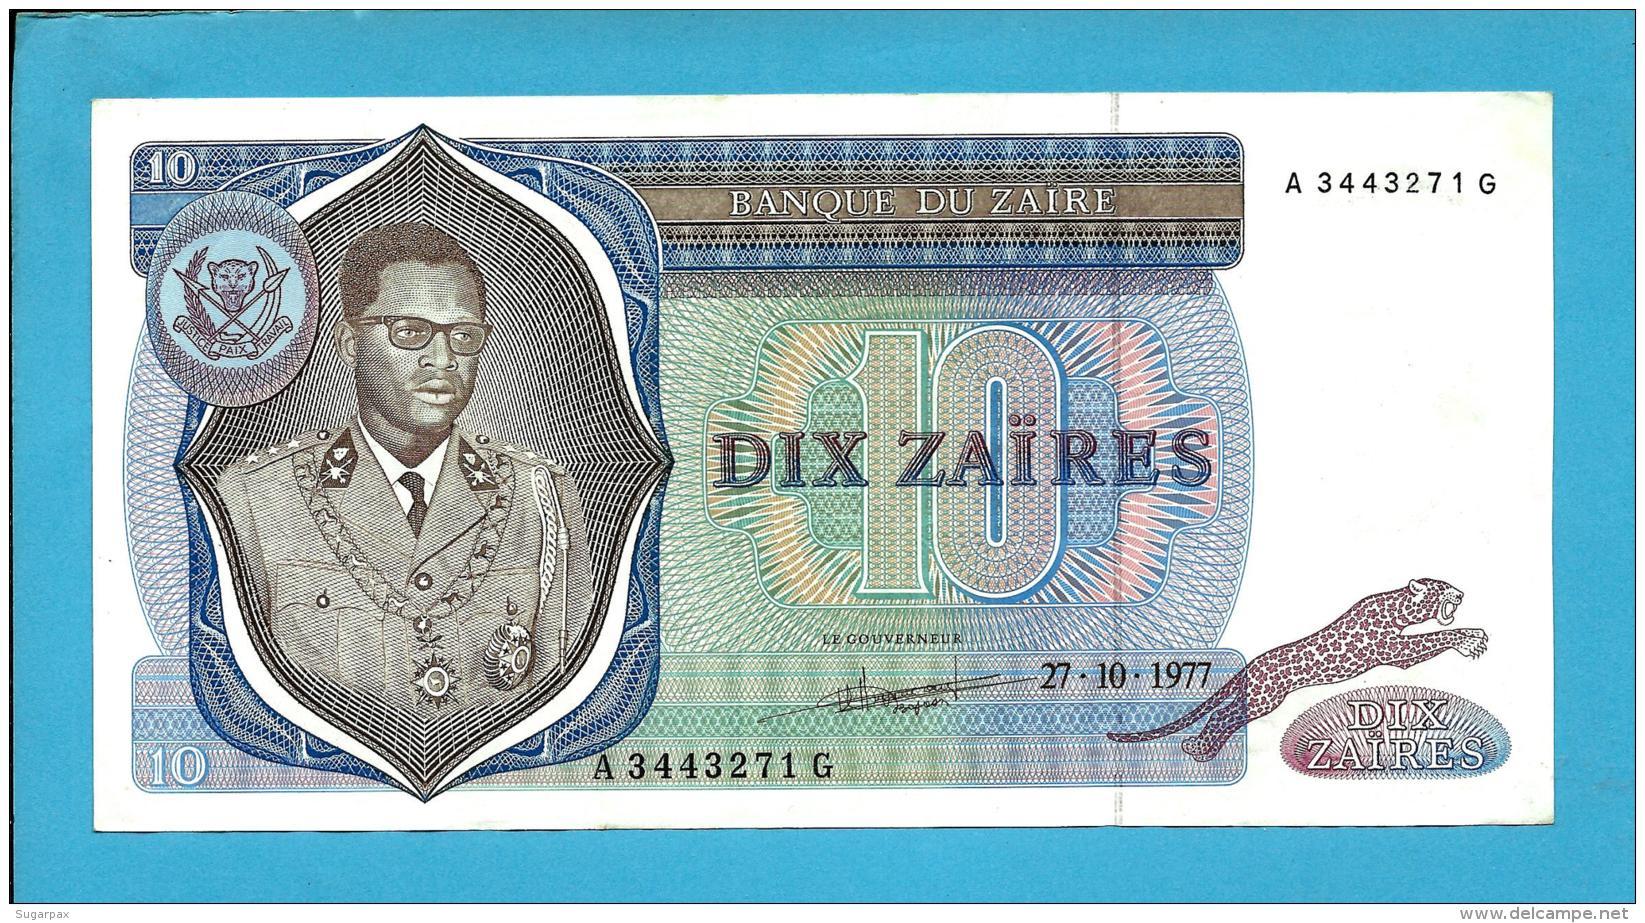 ZAIRE - 10 ZAIRES - 27/10/1977 - Pick 23.b - Sign. 4 - Mobutu - 2 Scans - Zaire